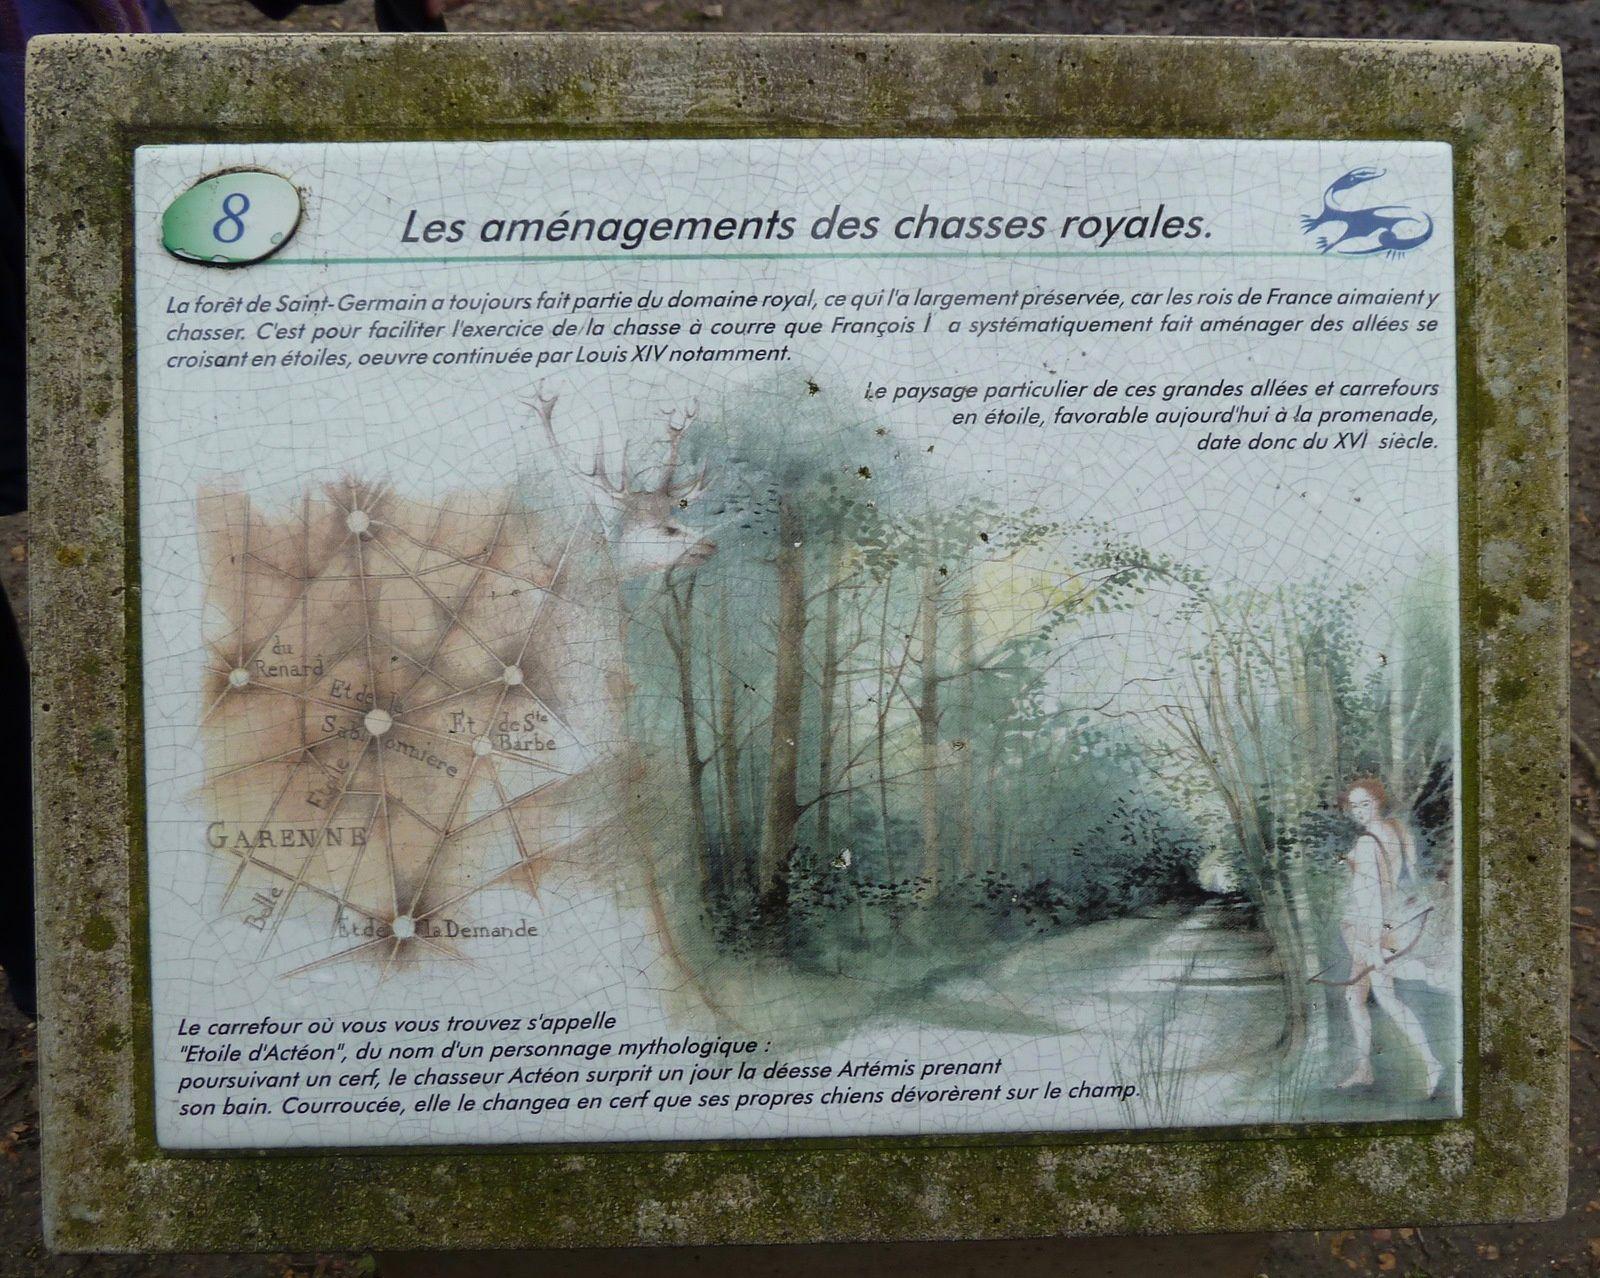 Randonnée de Saint-Germain-en-Laye à Poissy - 10 km.